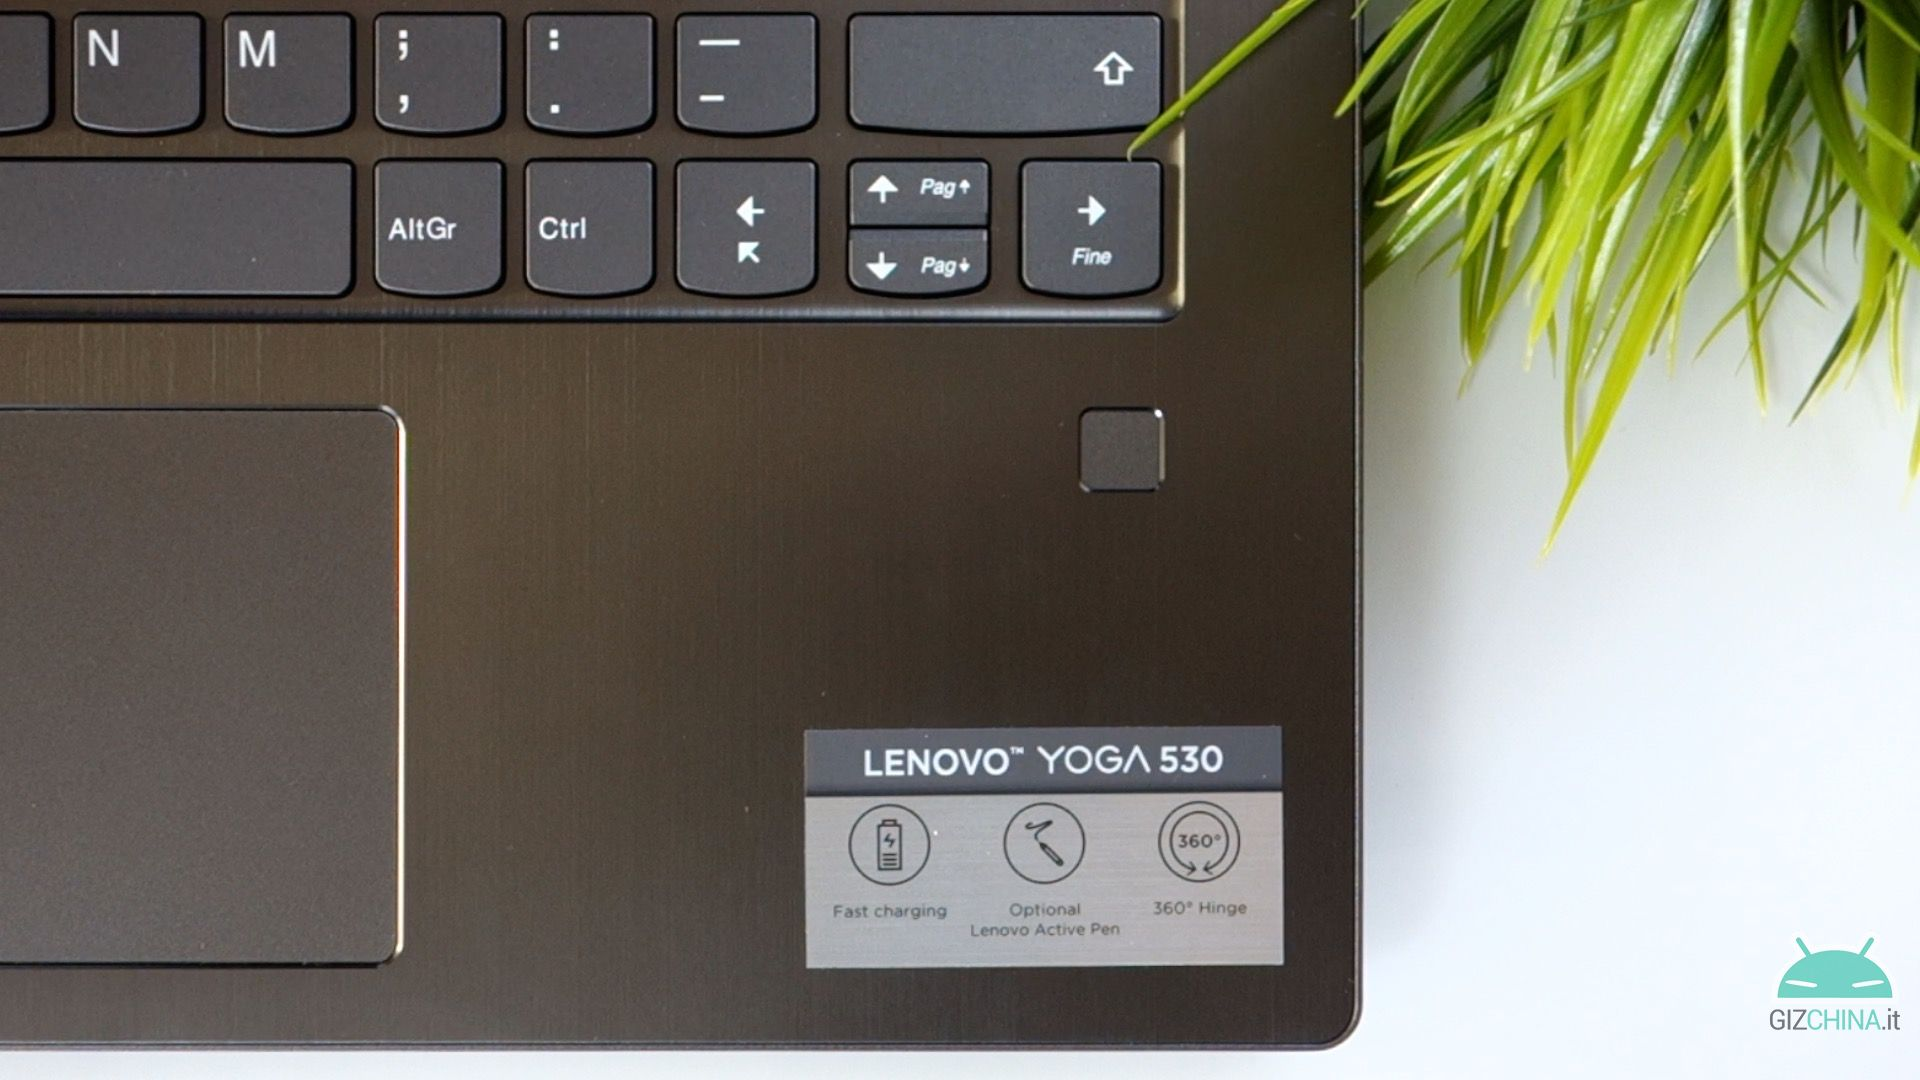 Lenovo 530 Yoga